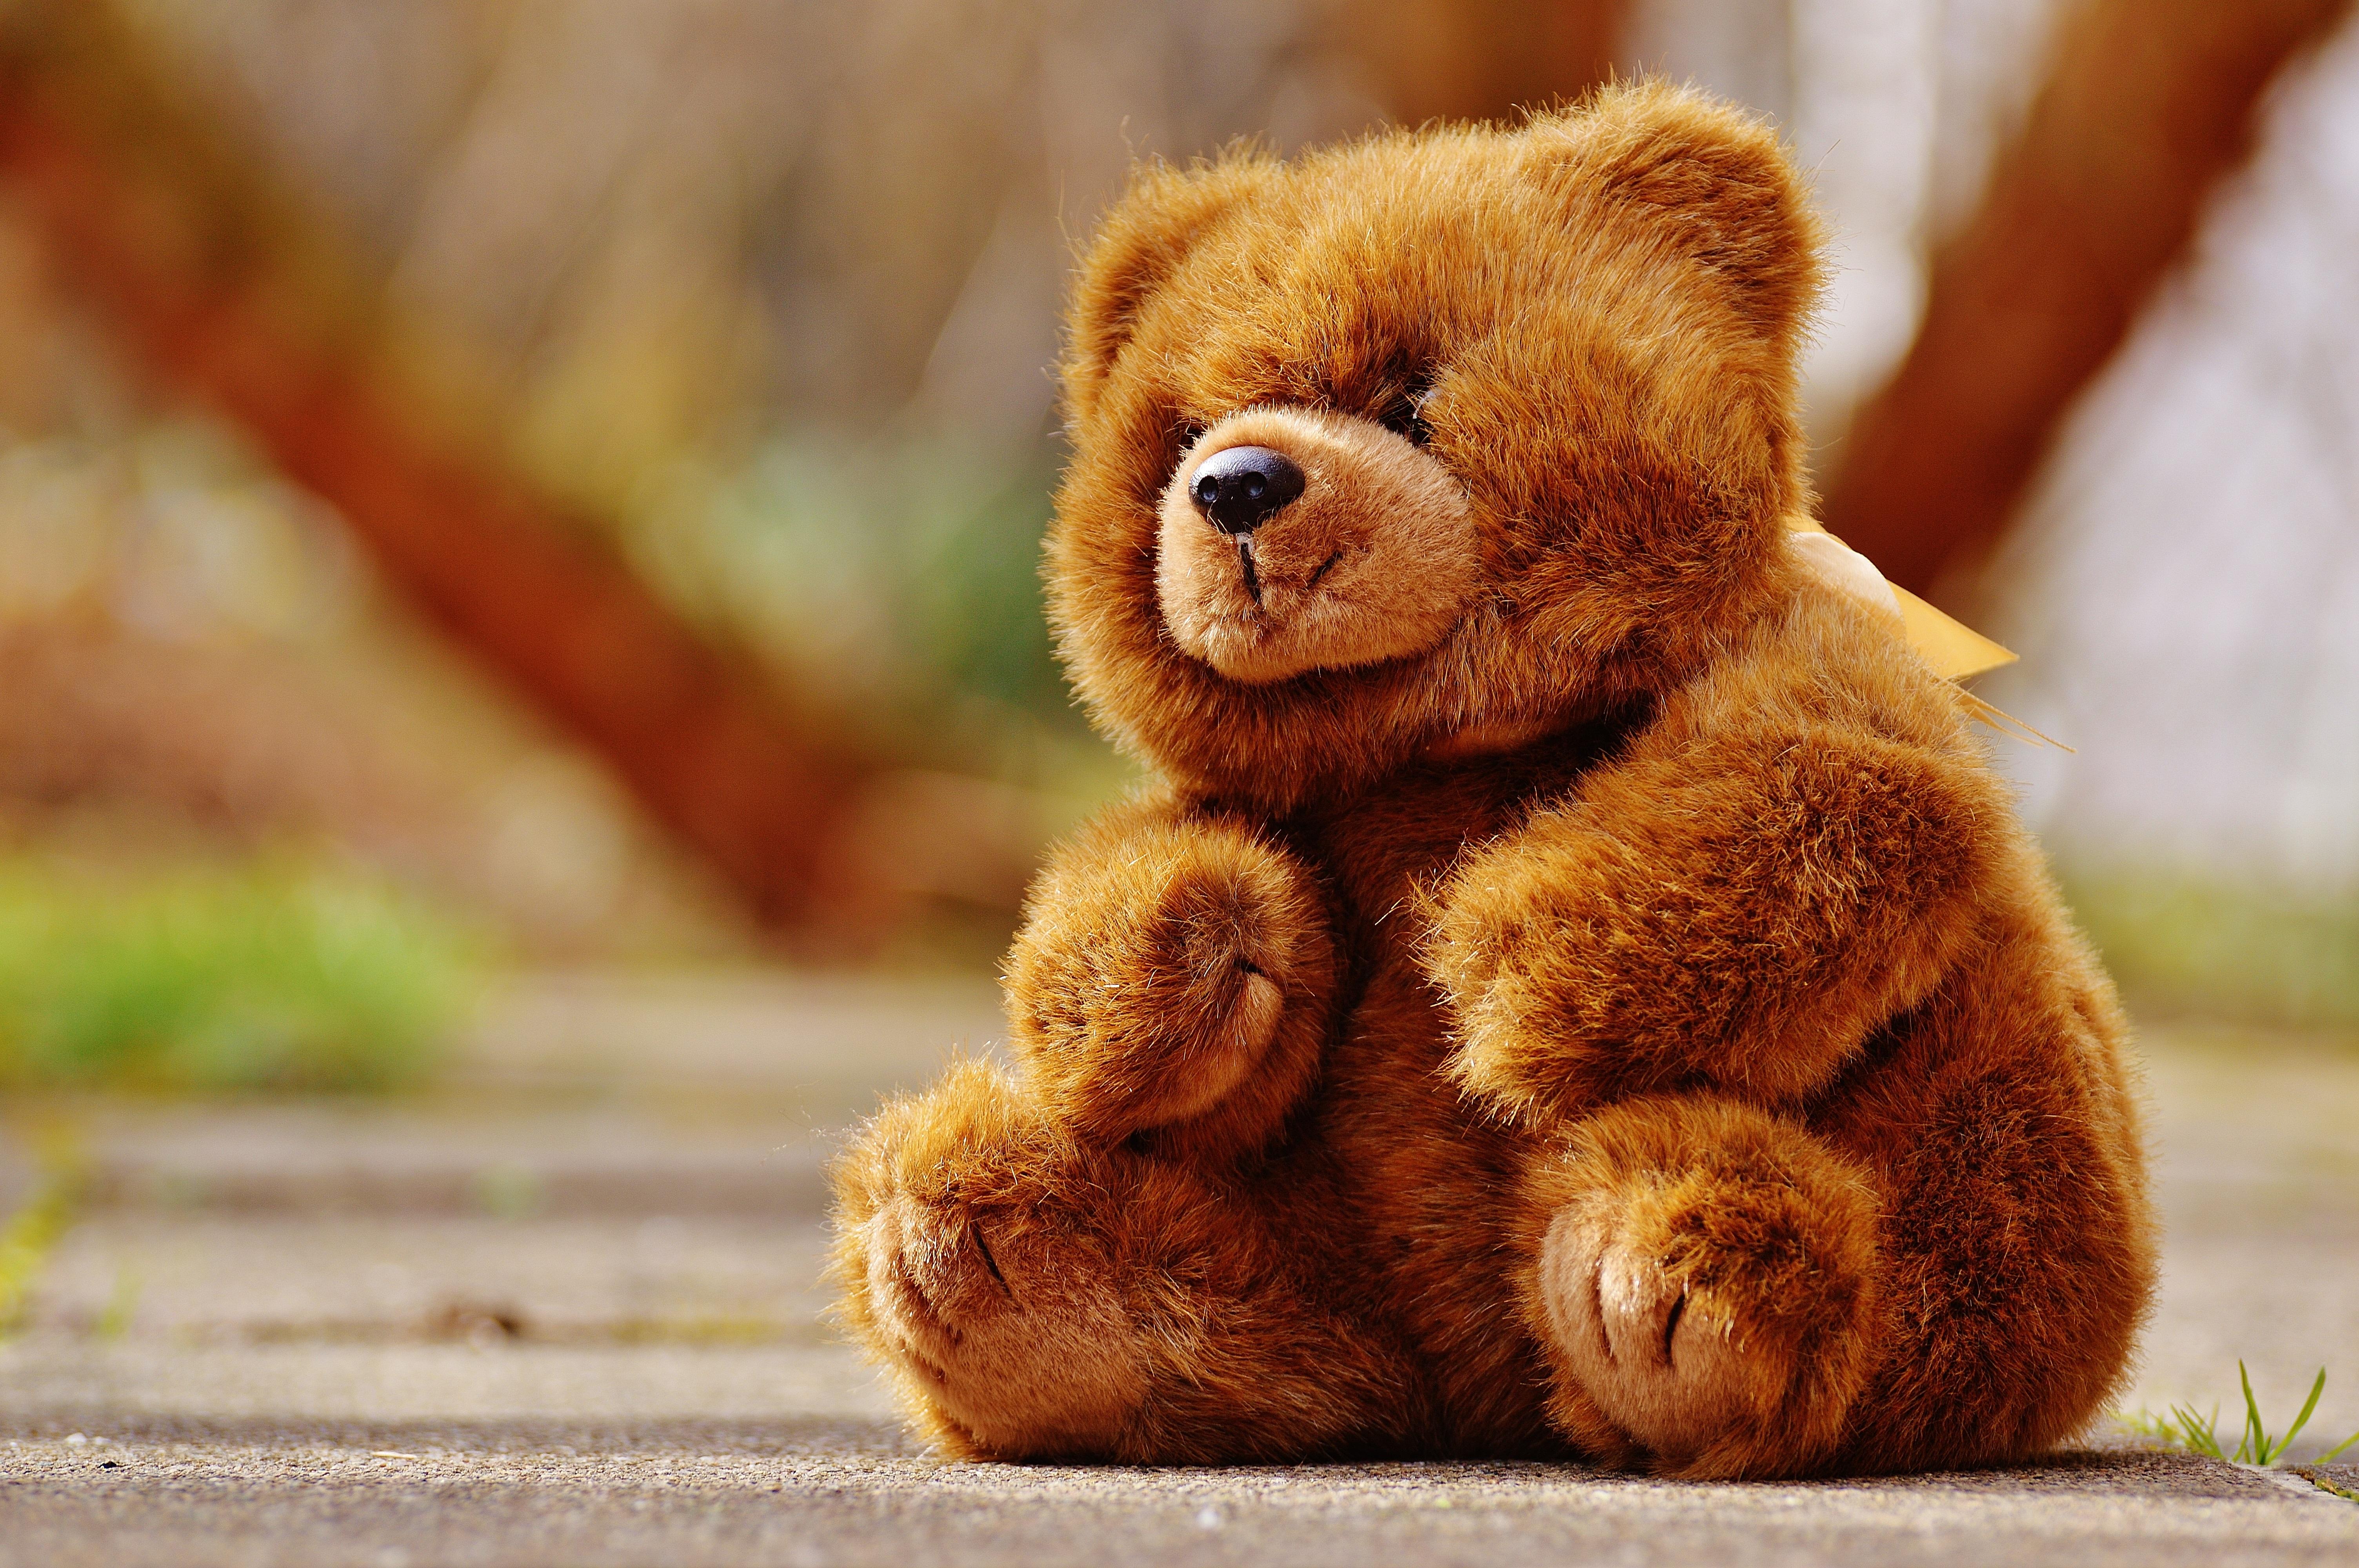 Honey teddy bears in love: crochet pattern - Amigurumi Today Pictures of brown teddy bears